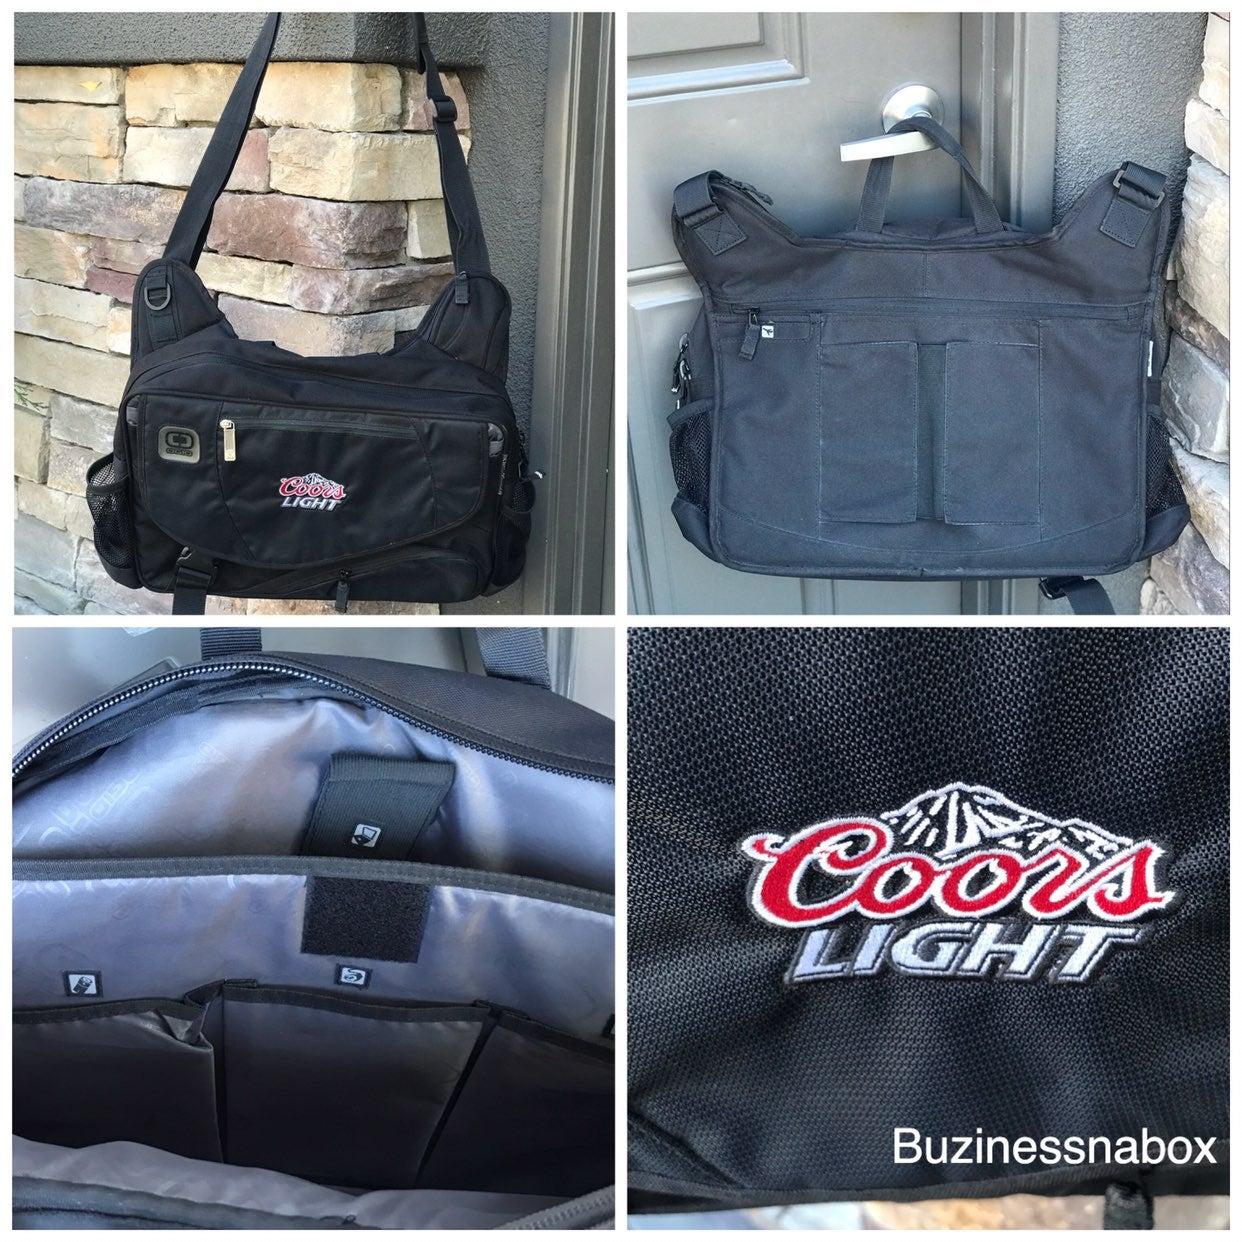 Coors Light Ogio Street Messenger Bag